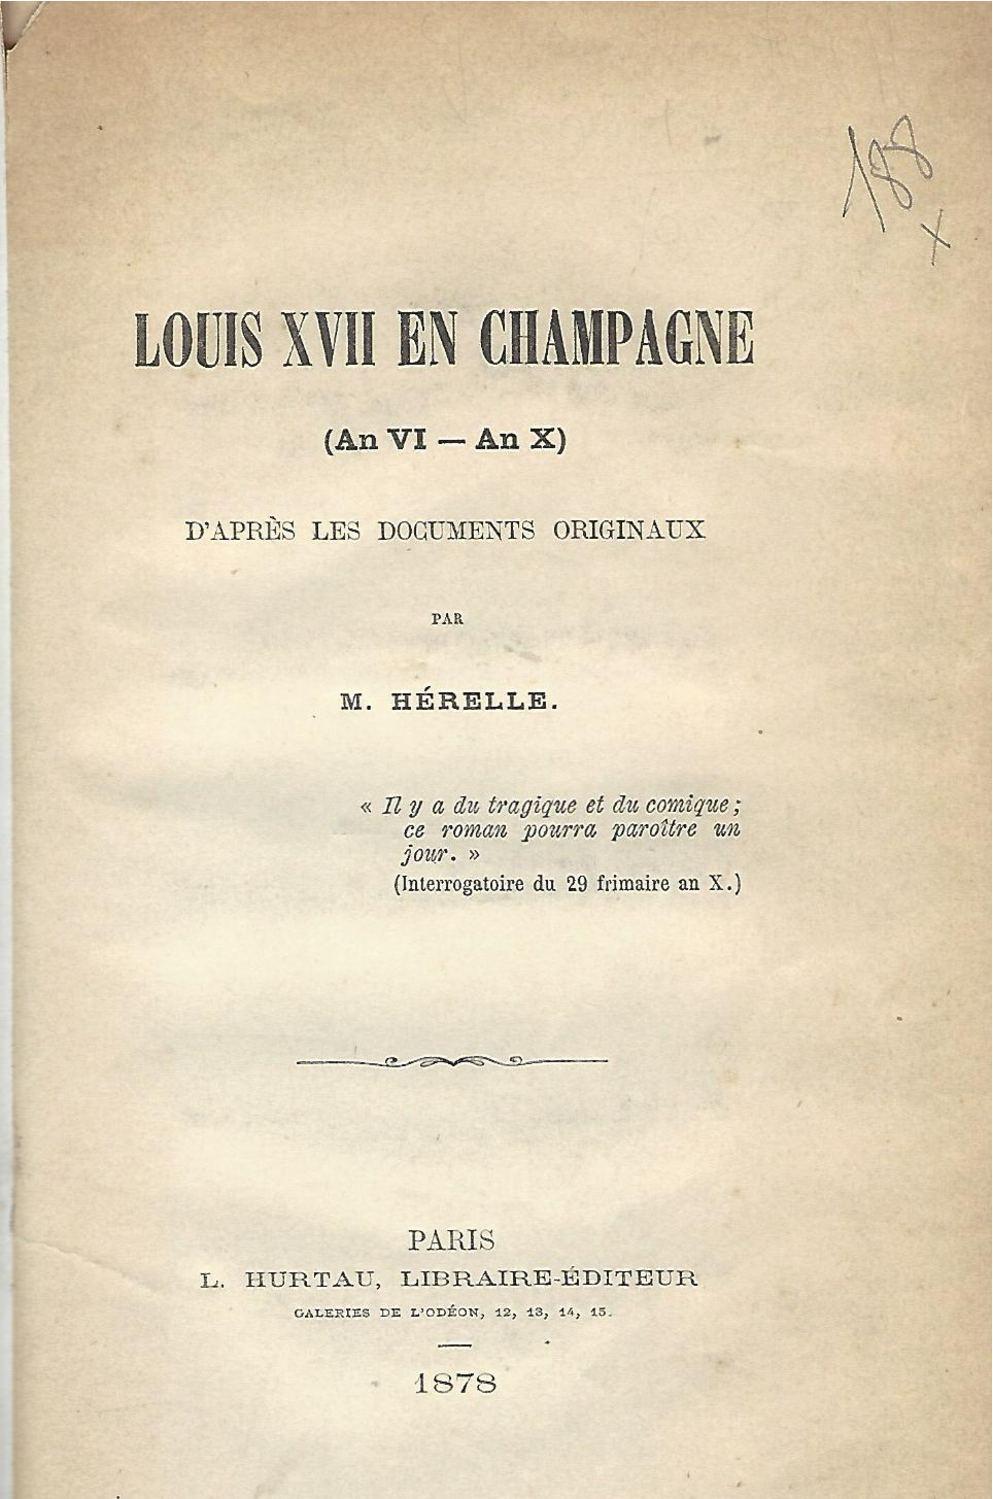 Georges Herelle, Louis XVII en Champagne